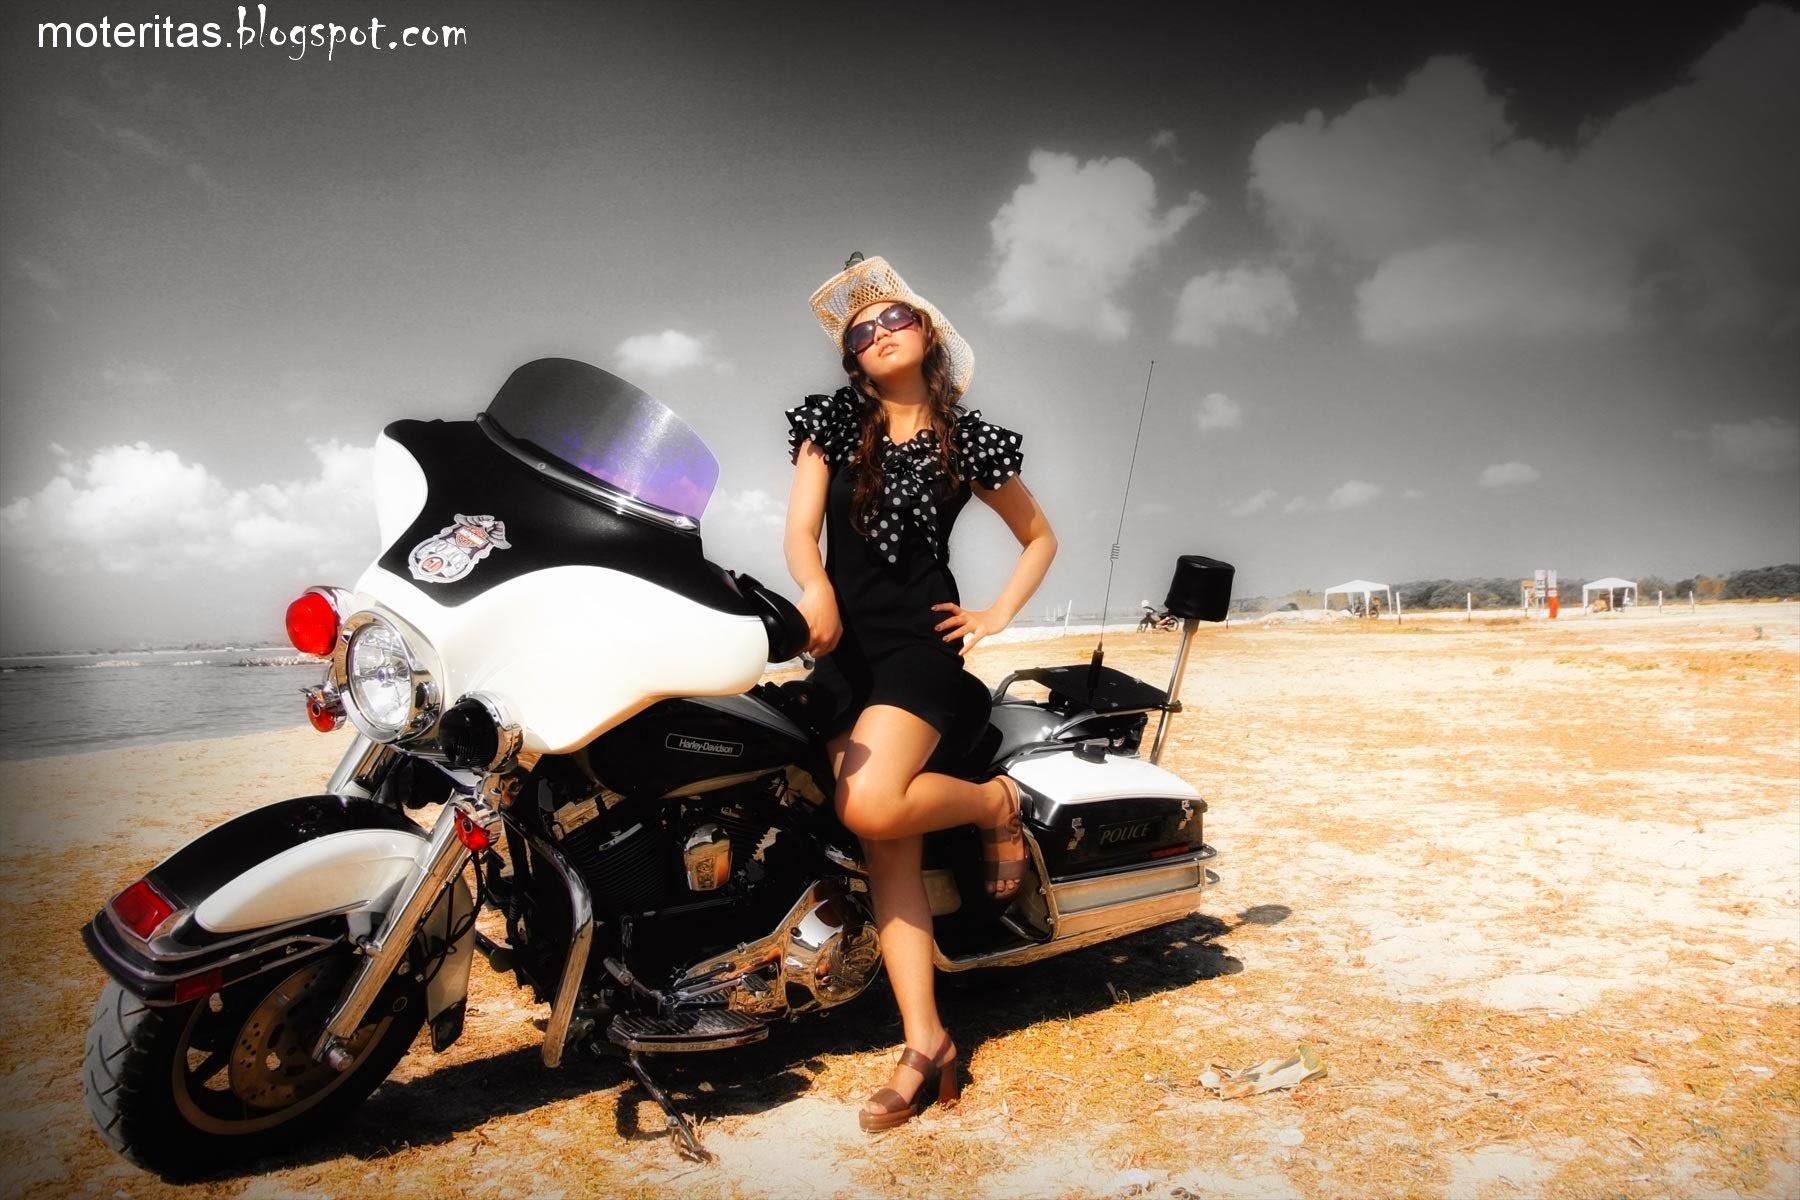 Cop motorcycle bikini